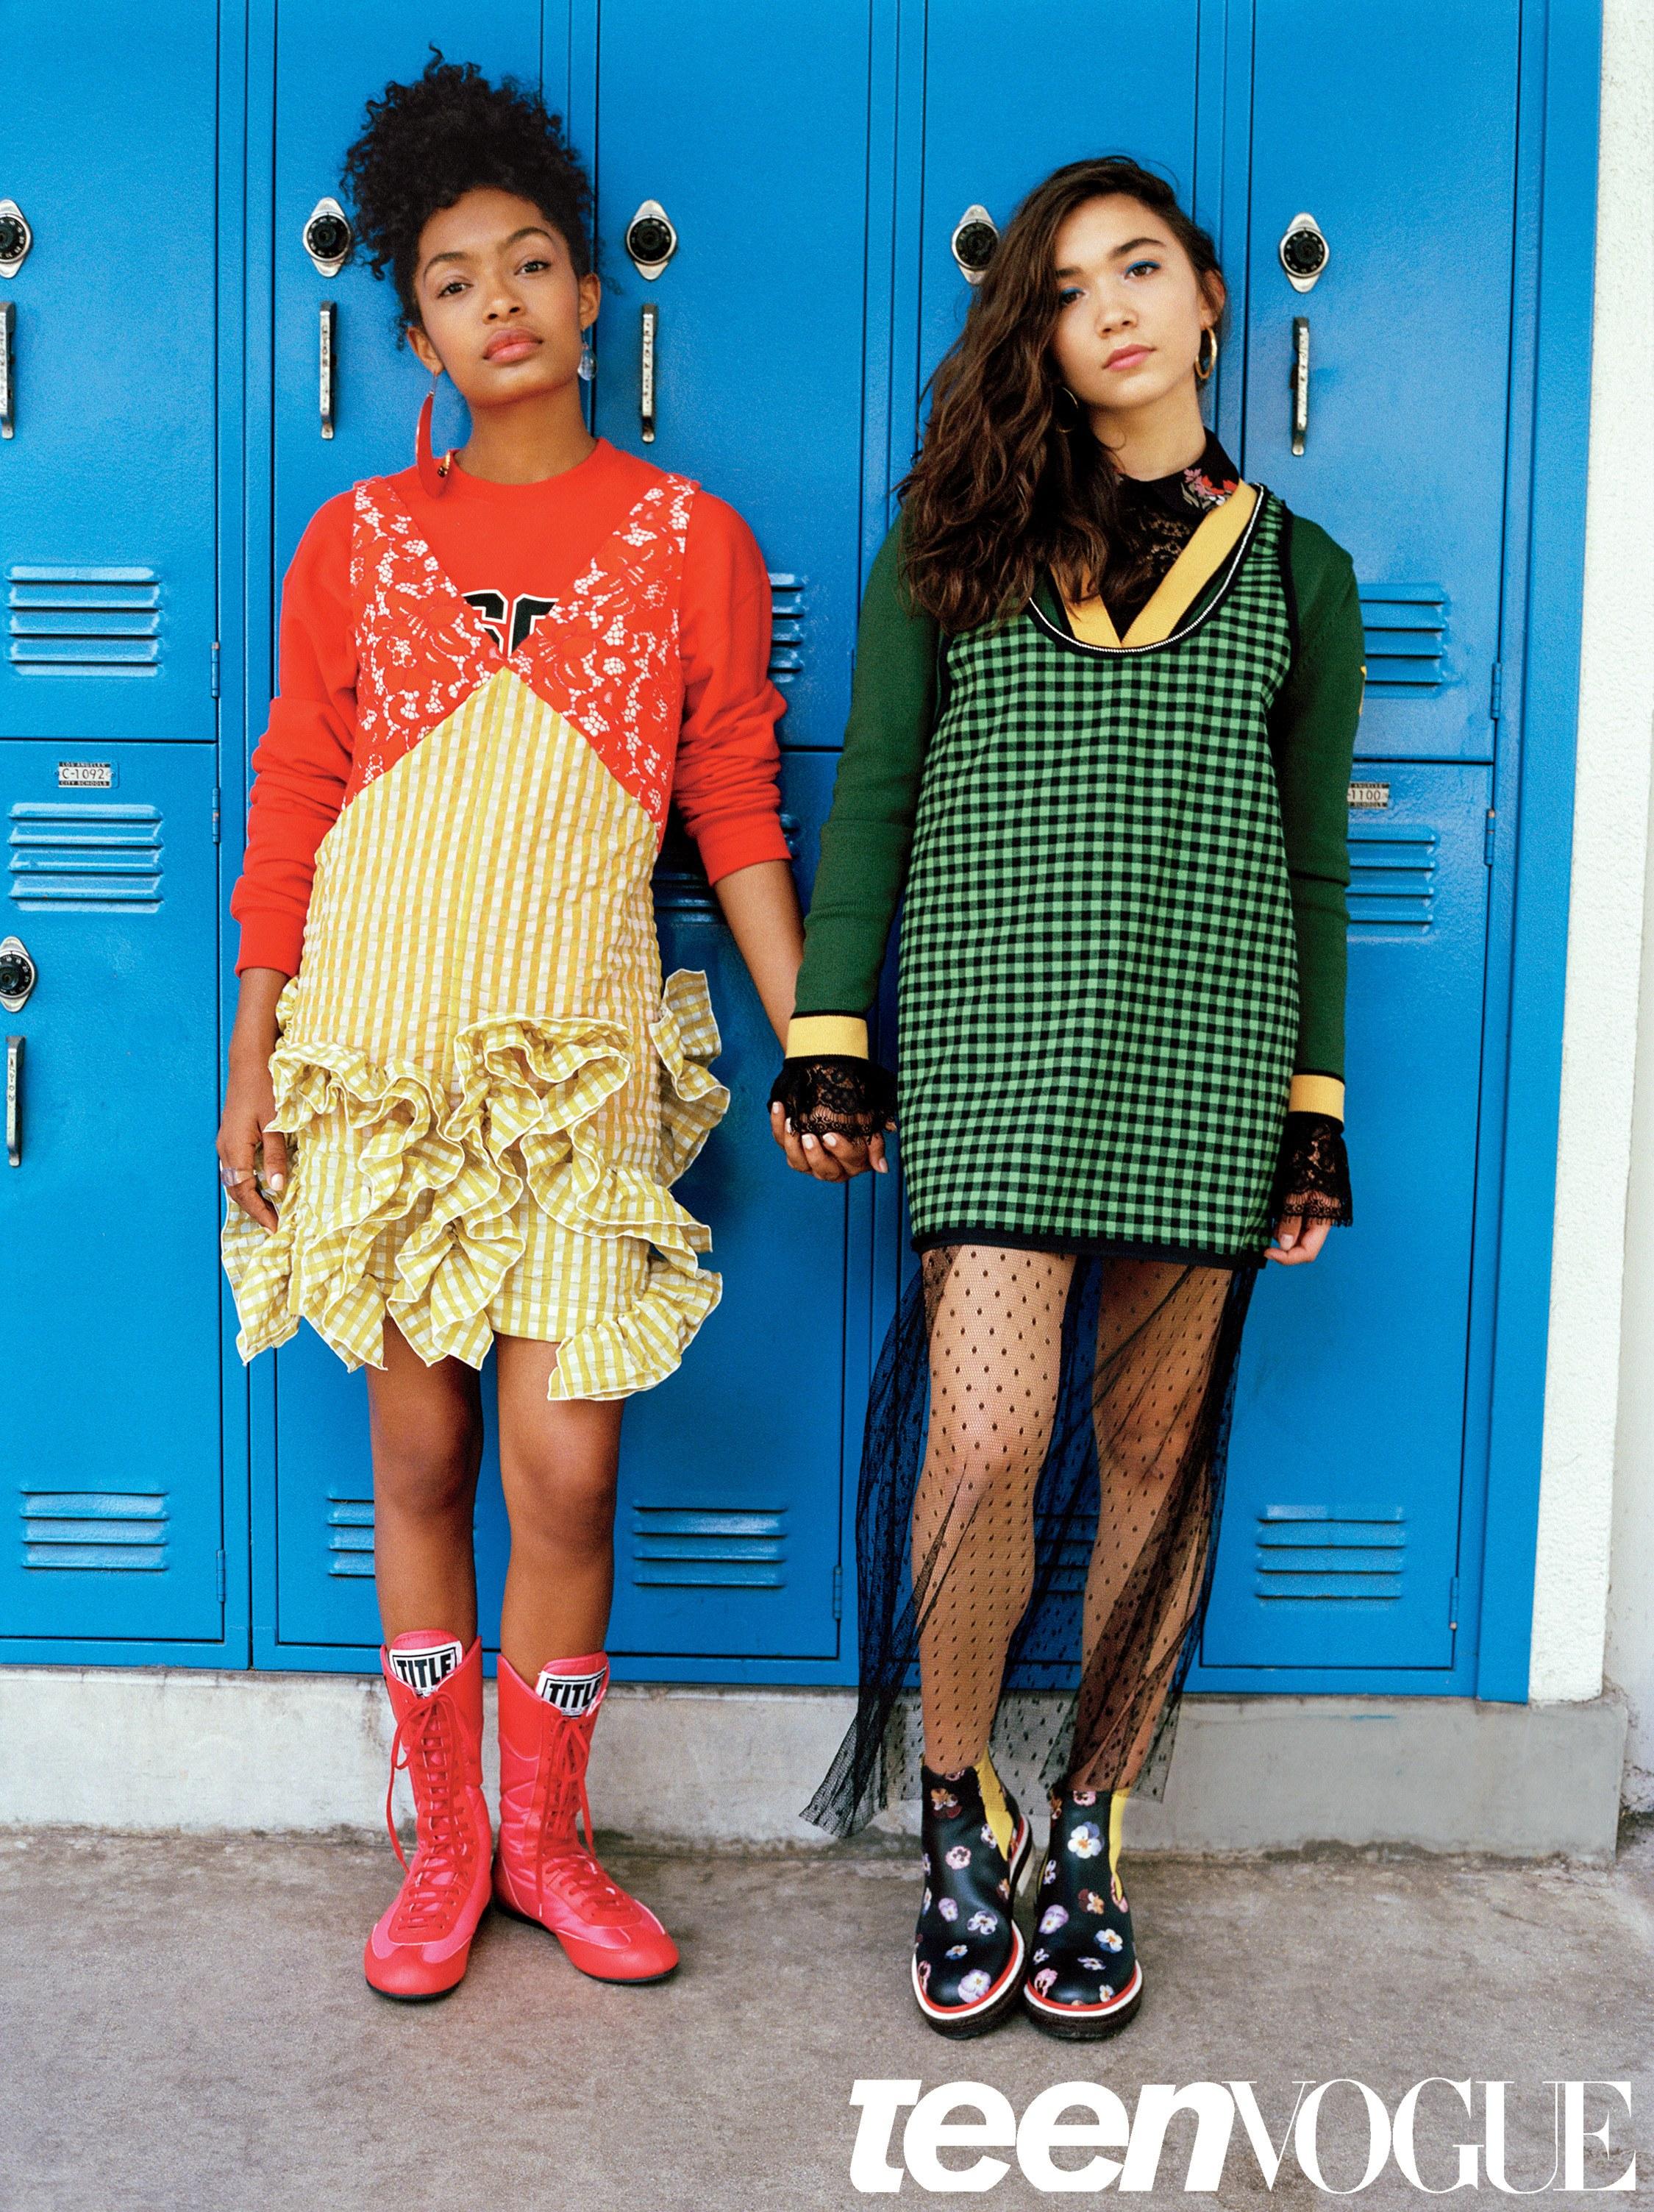 Image: Yara Shahidi and Rowan Blanchard for Teen Vogue